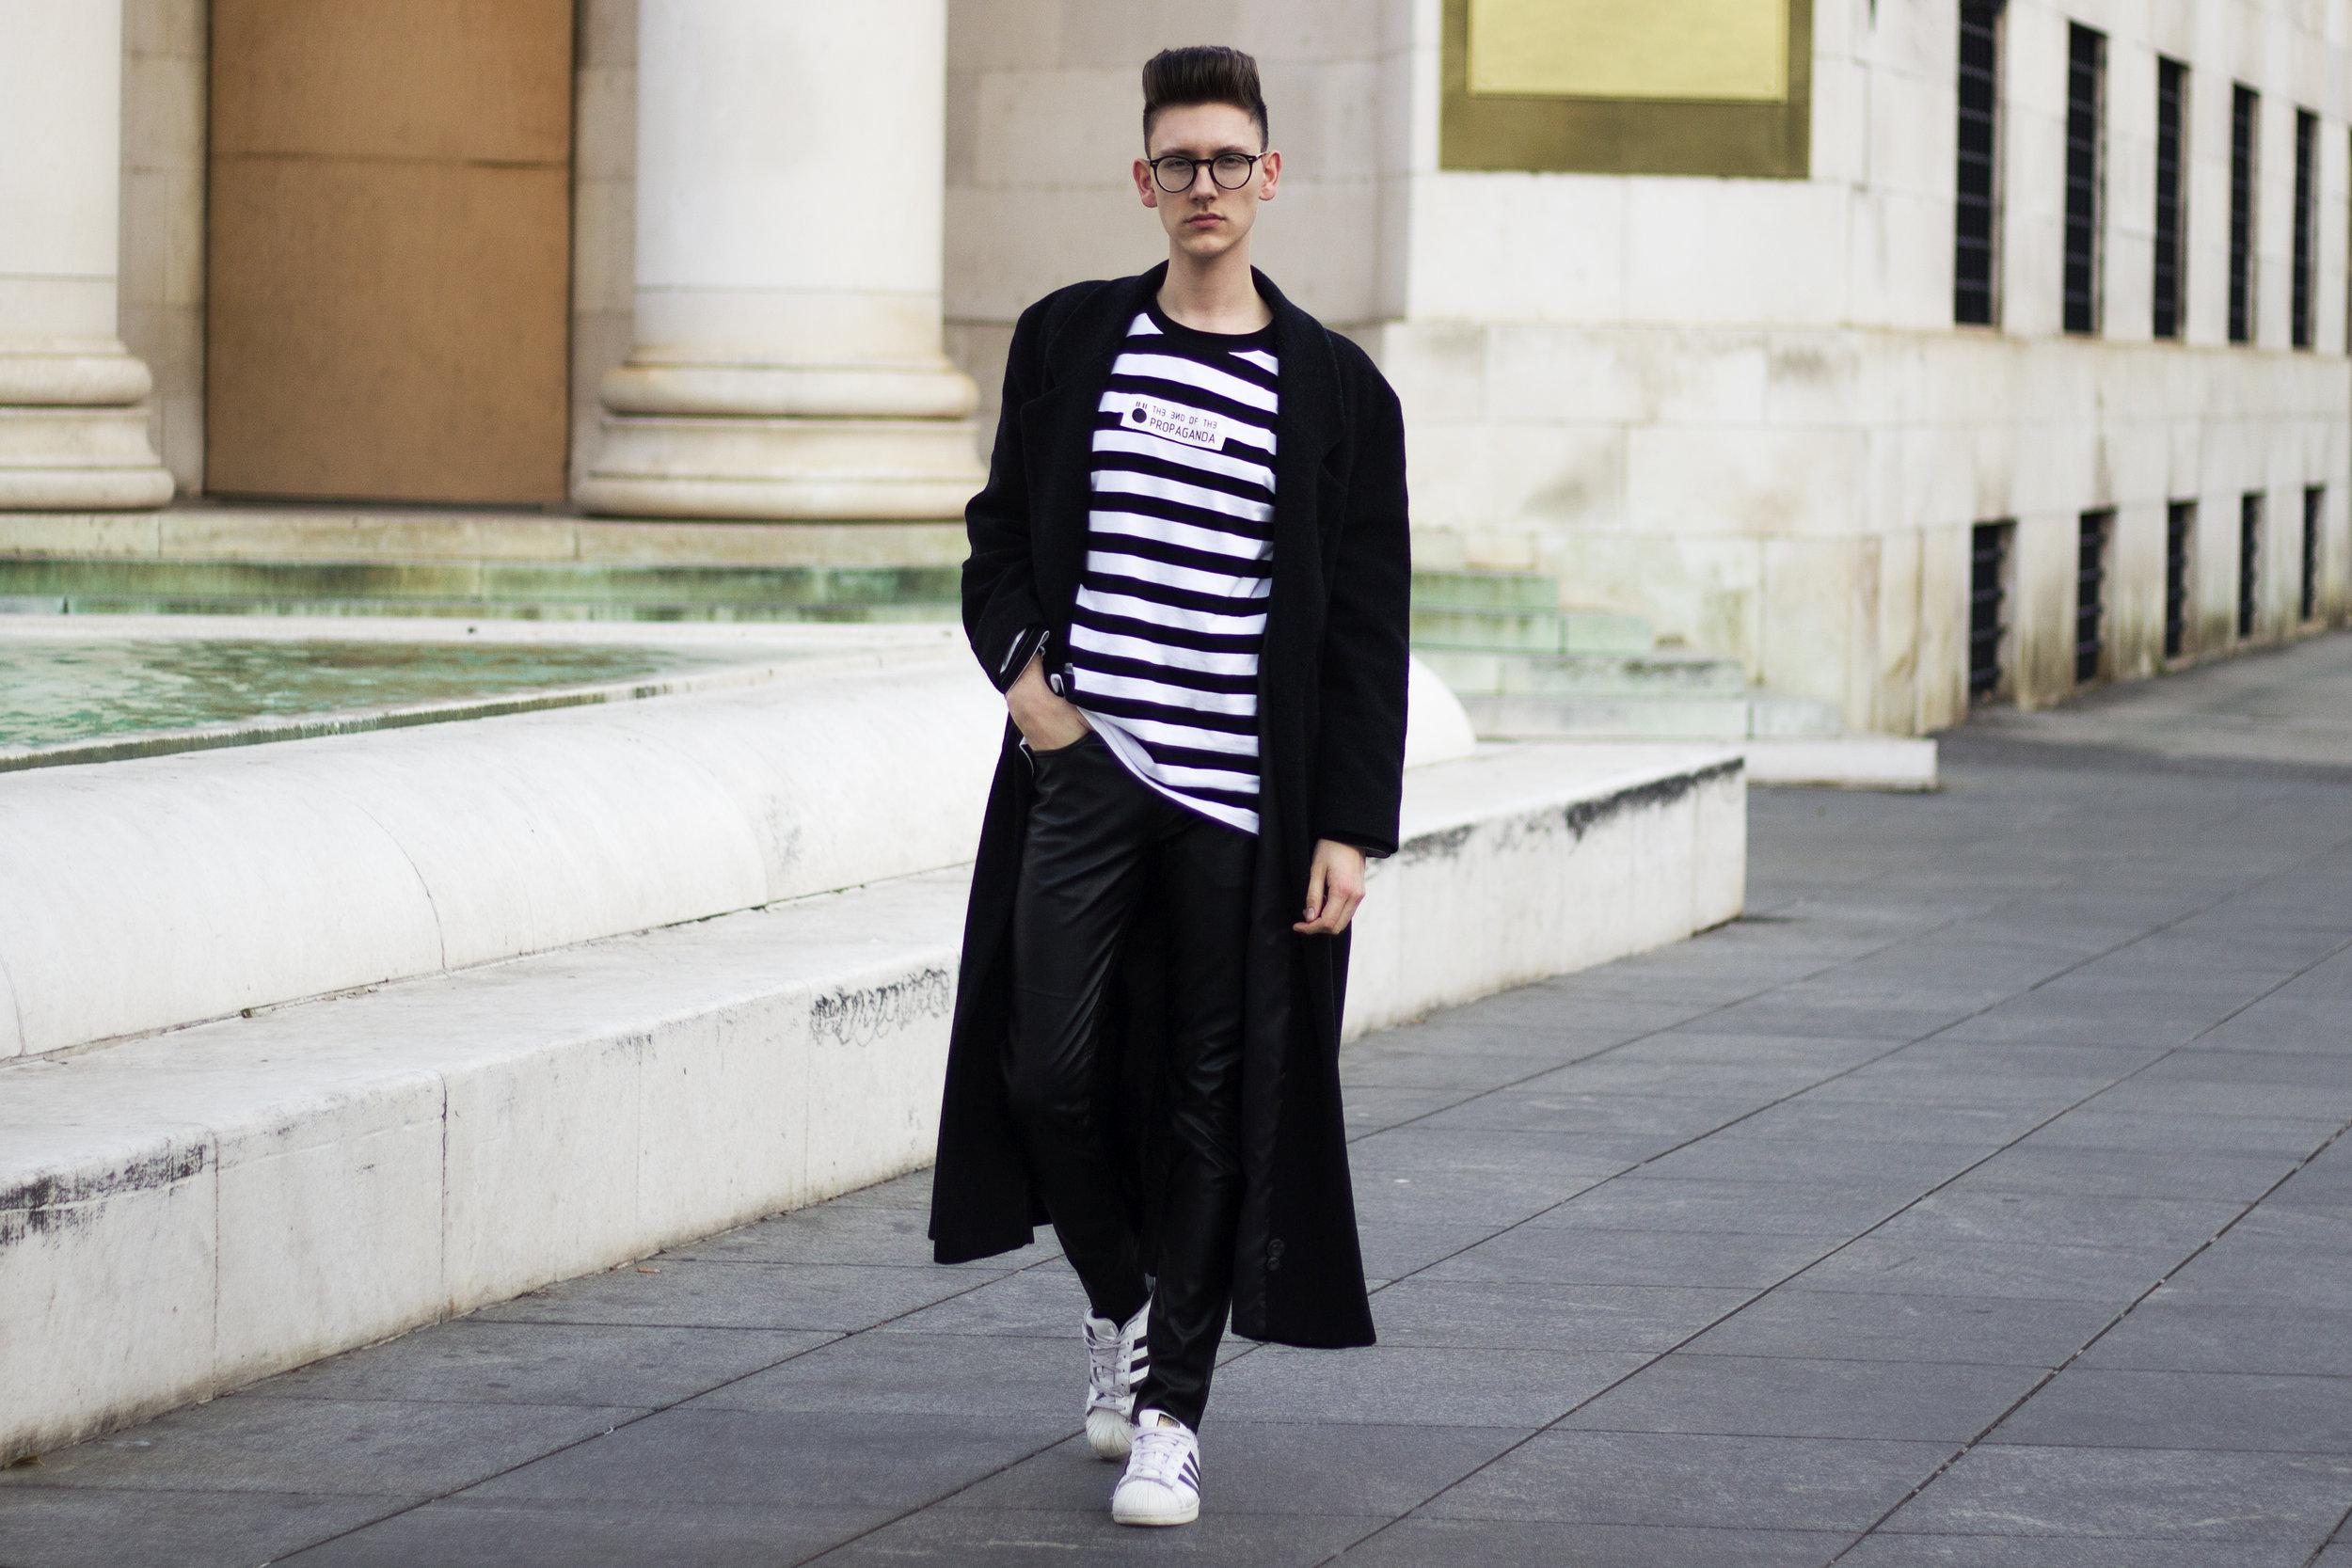 luka-lajic-expensive-reality-hm-mens-fashion-croatia-blogger (1).jpg